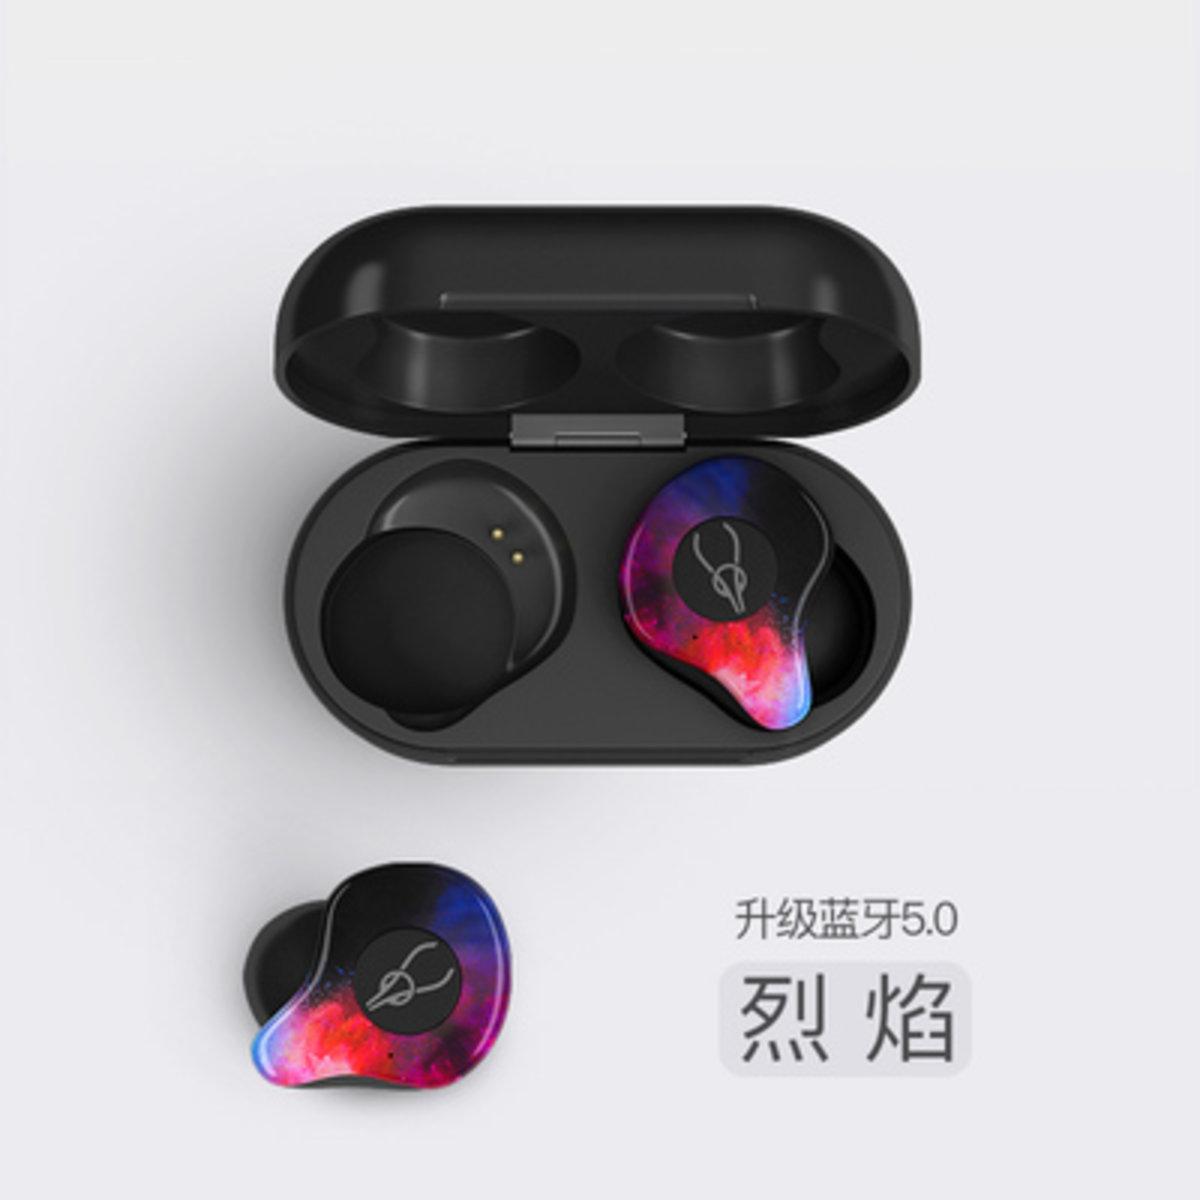 X12 Pro 2019 version True Wireless Earbuds - Flame